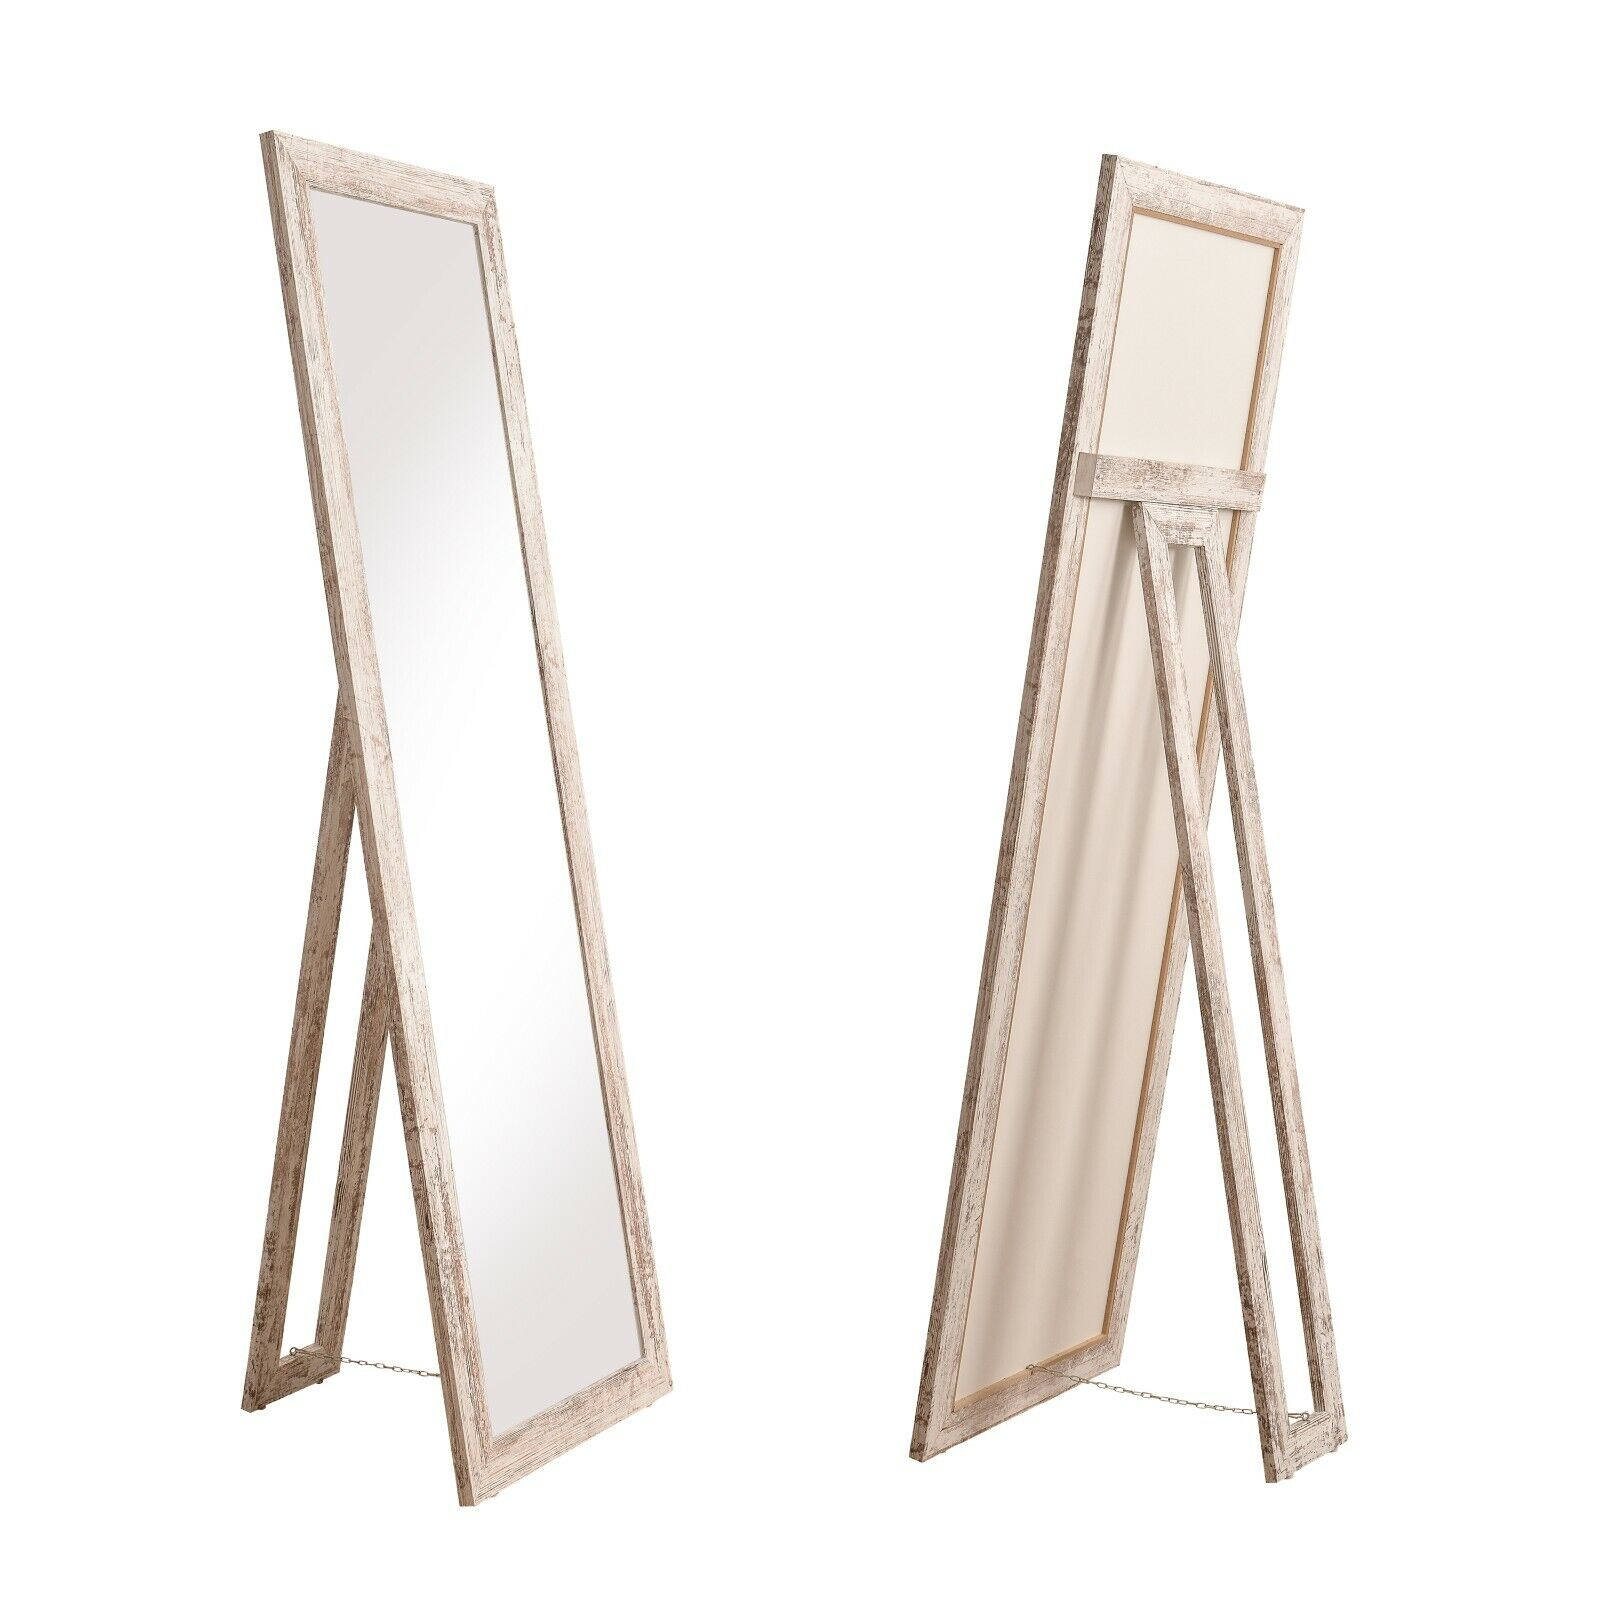 Standspiegel Milan moderner Ganzkörper Ankleide-Spiegel in Vintage 160x50cm